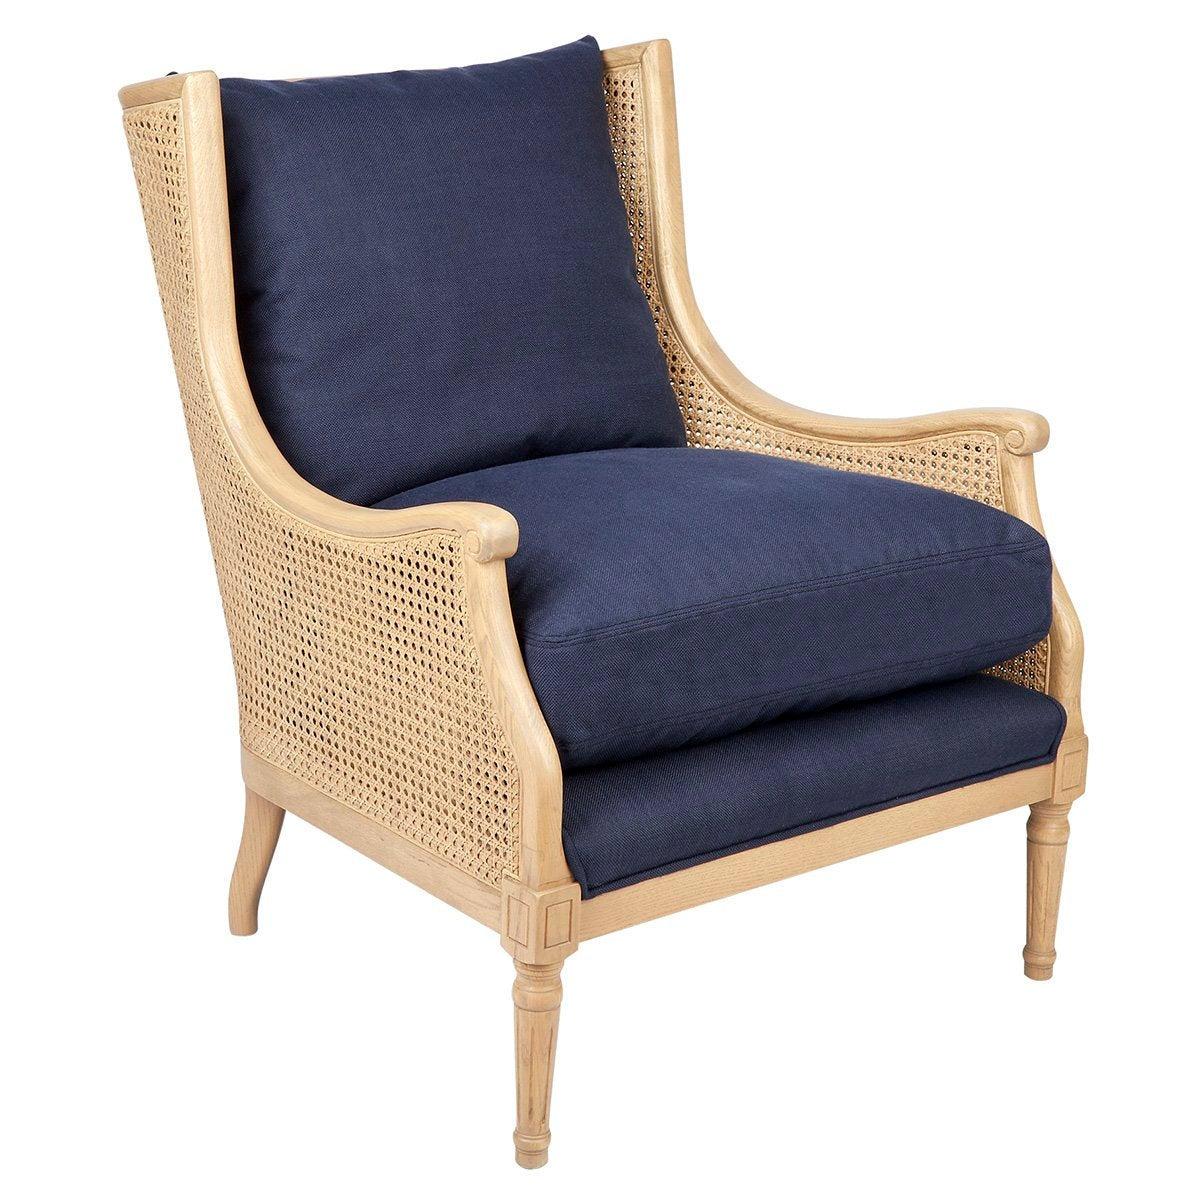 Havana Natural Rattan Arm Chair - Navy